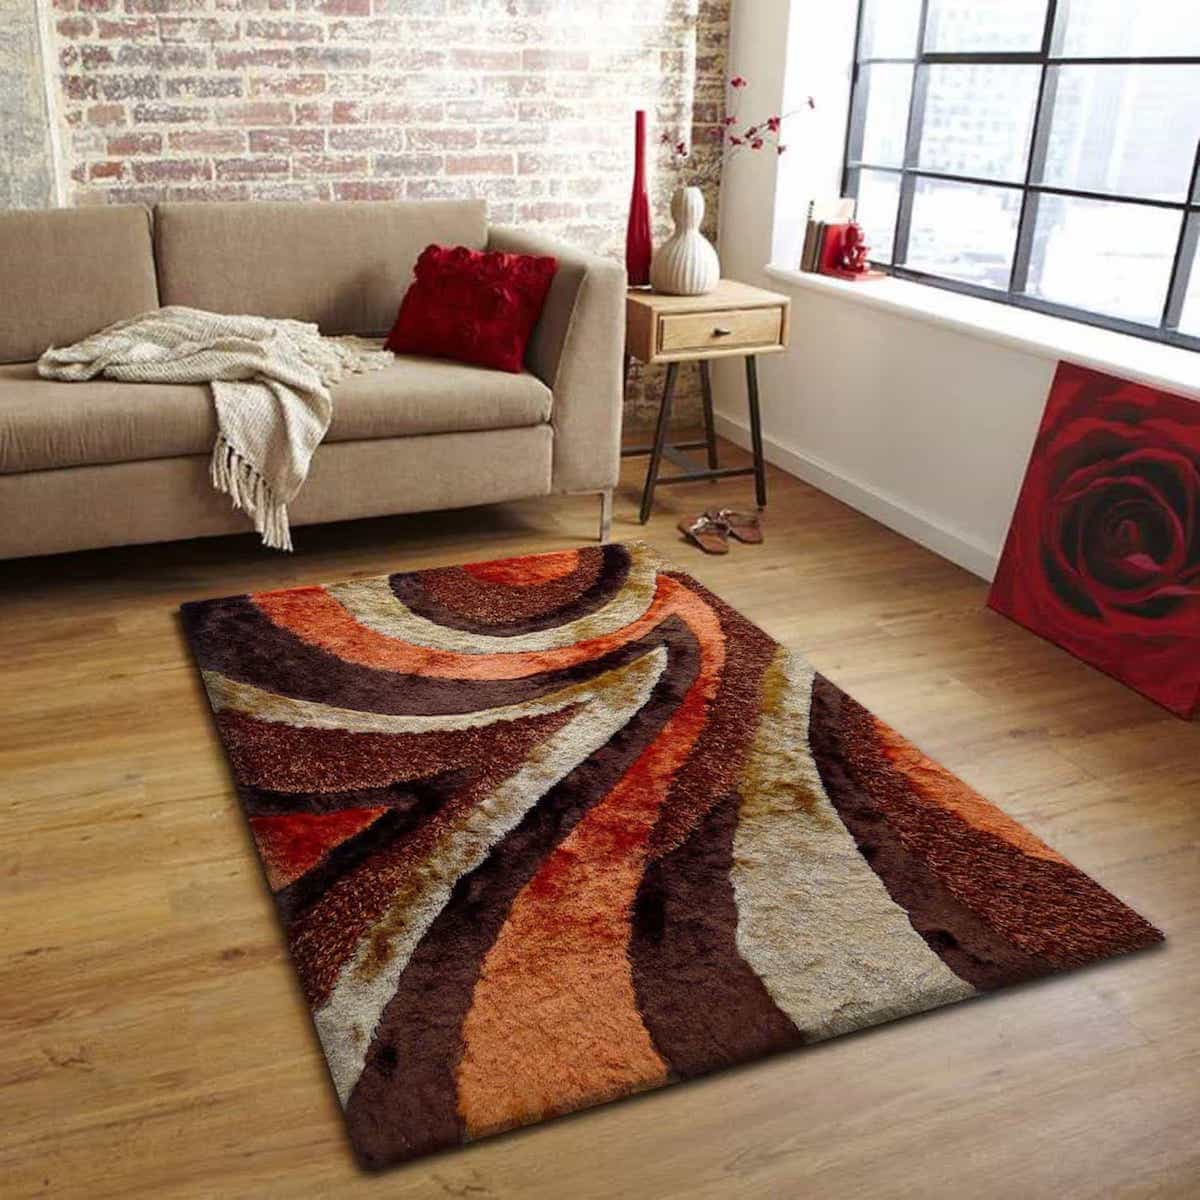 Ecarpetgallery Yeti Shag Rug For Living Room (View 9 of 15)